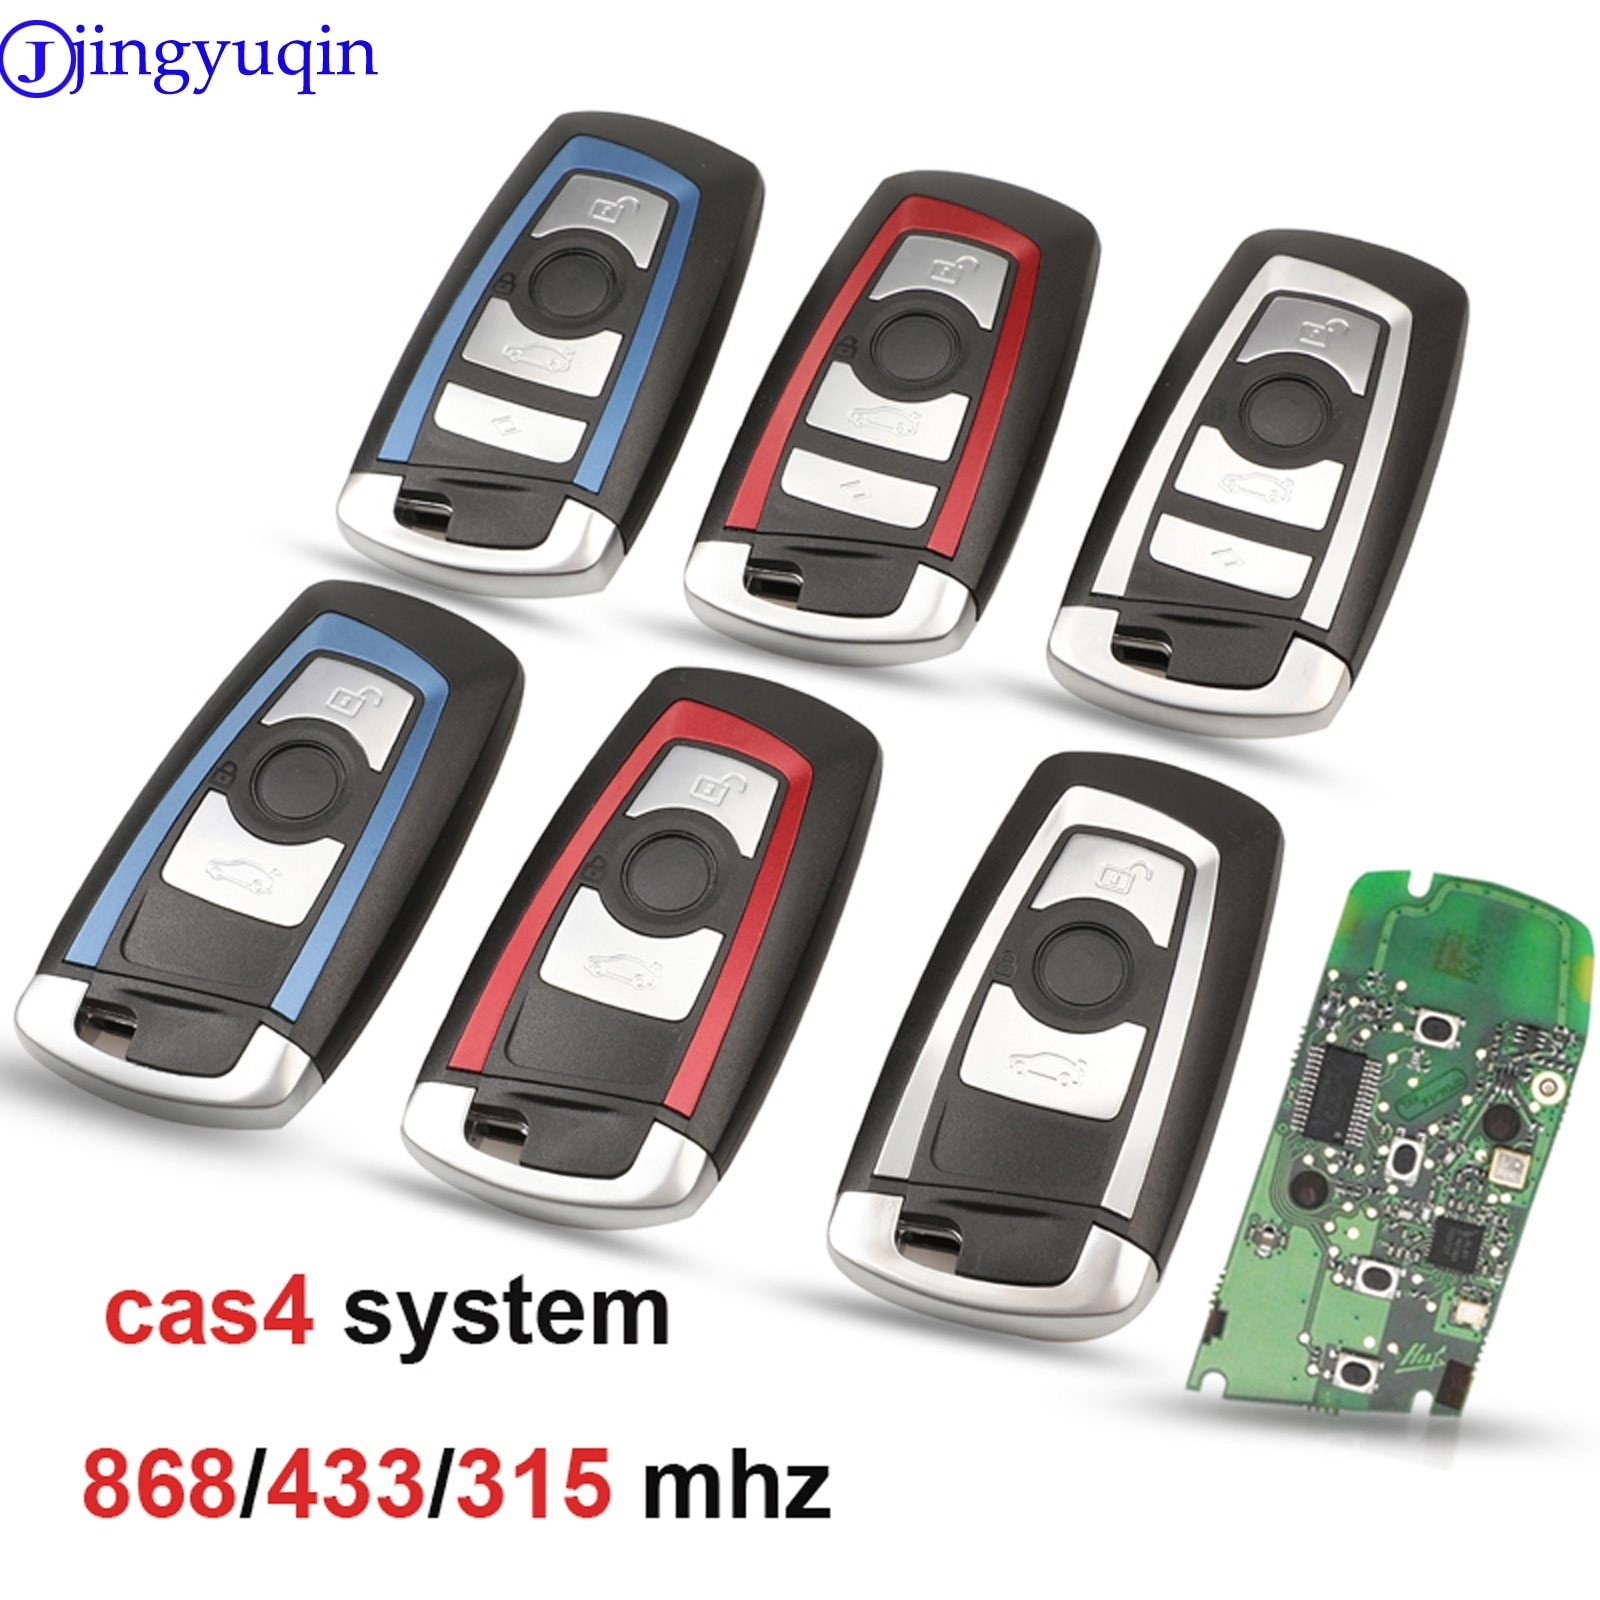 jingyuqin 5ps CAS4 868/315/433mhz Car Remote Smart Key For BMW 1 3 5 7 Series CAS4 System Auto Vehichle Alarm Keyless Fob